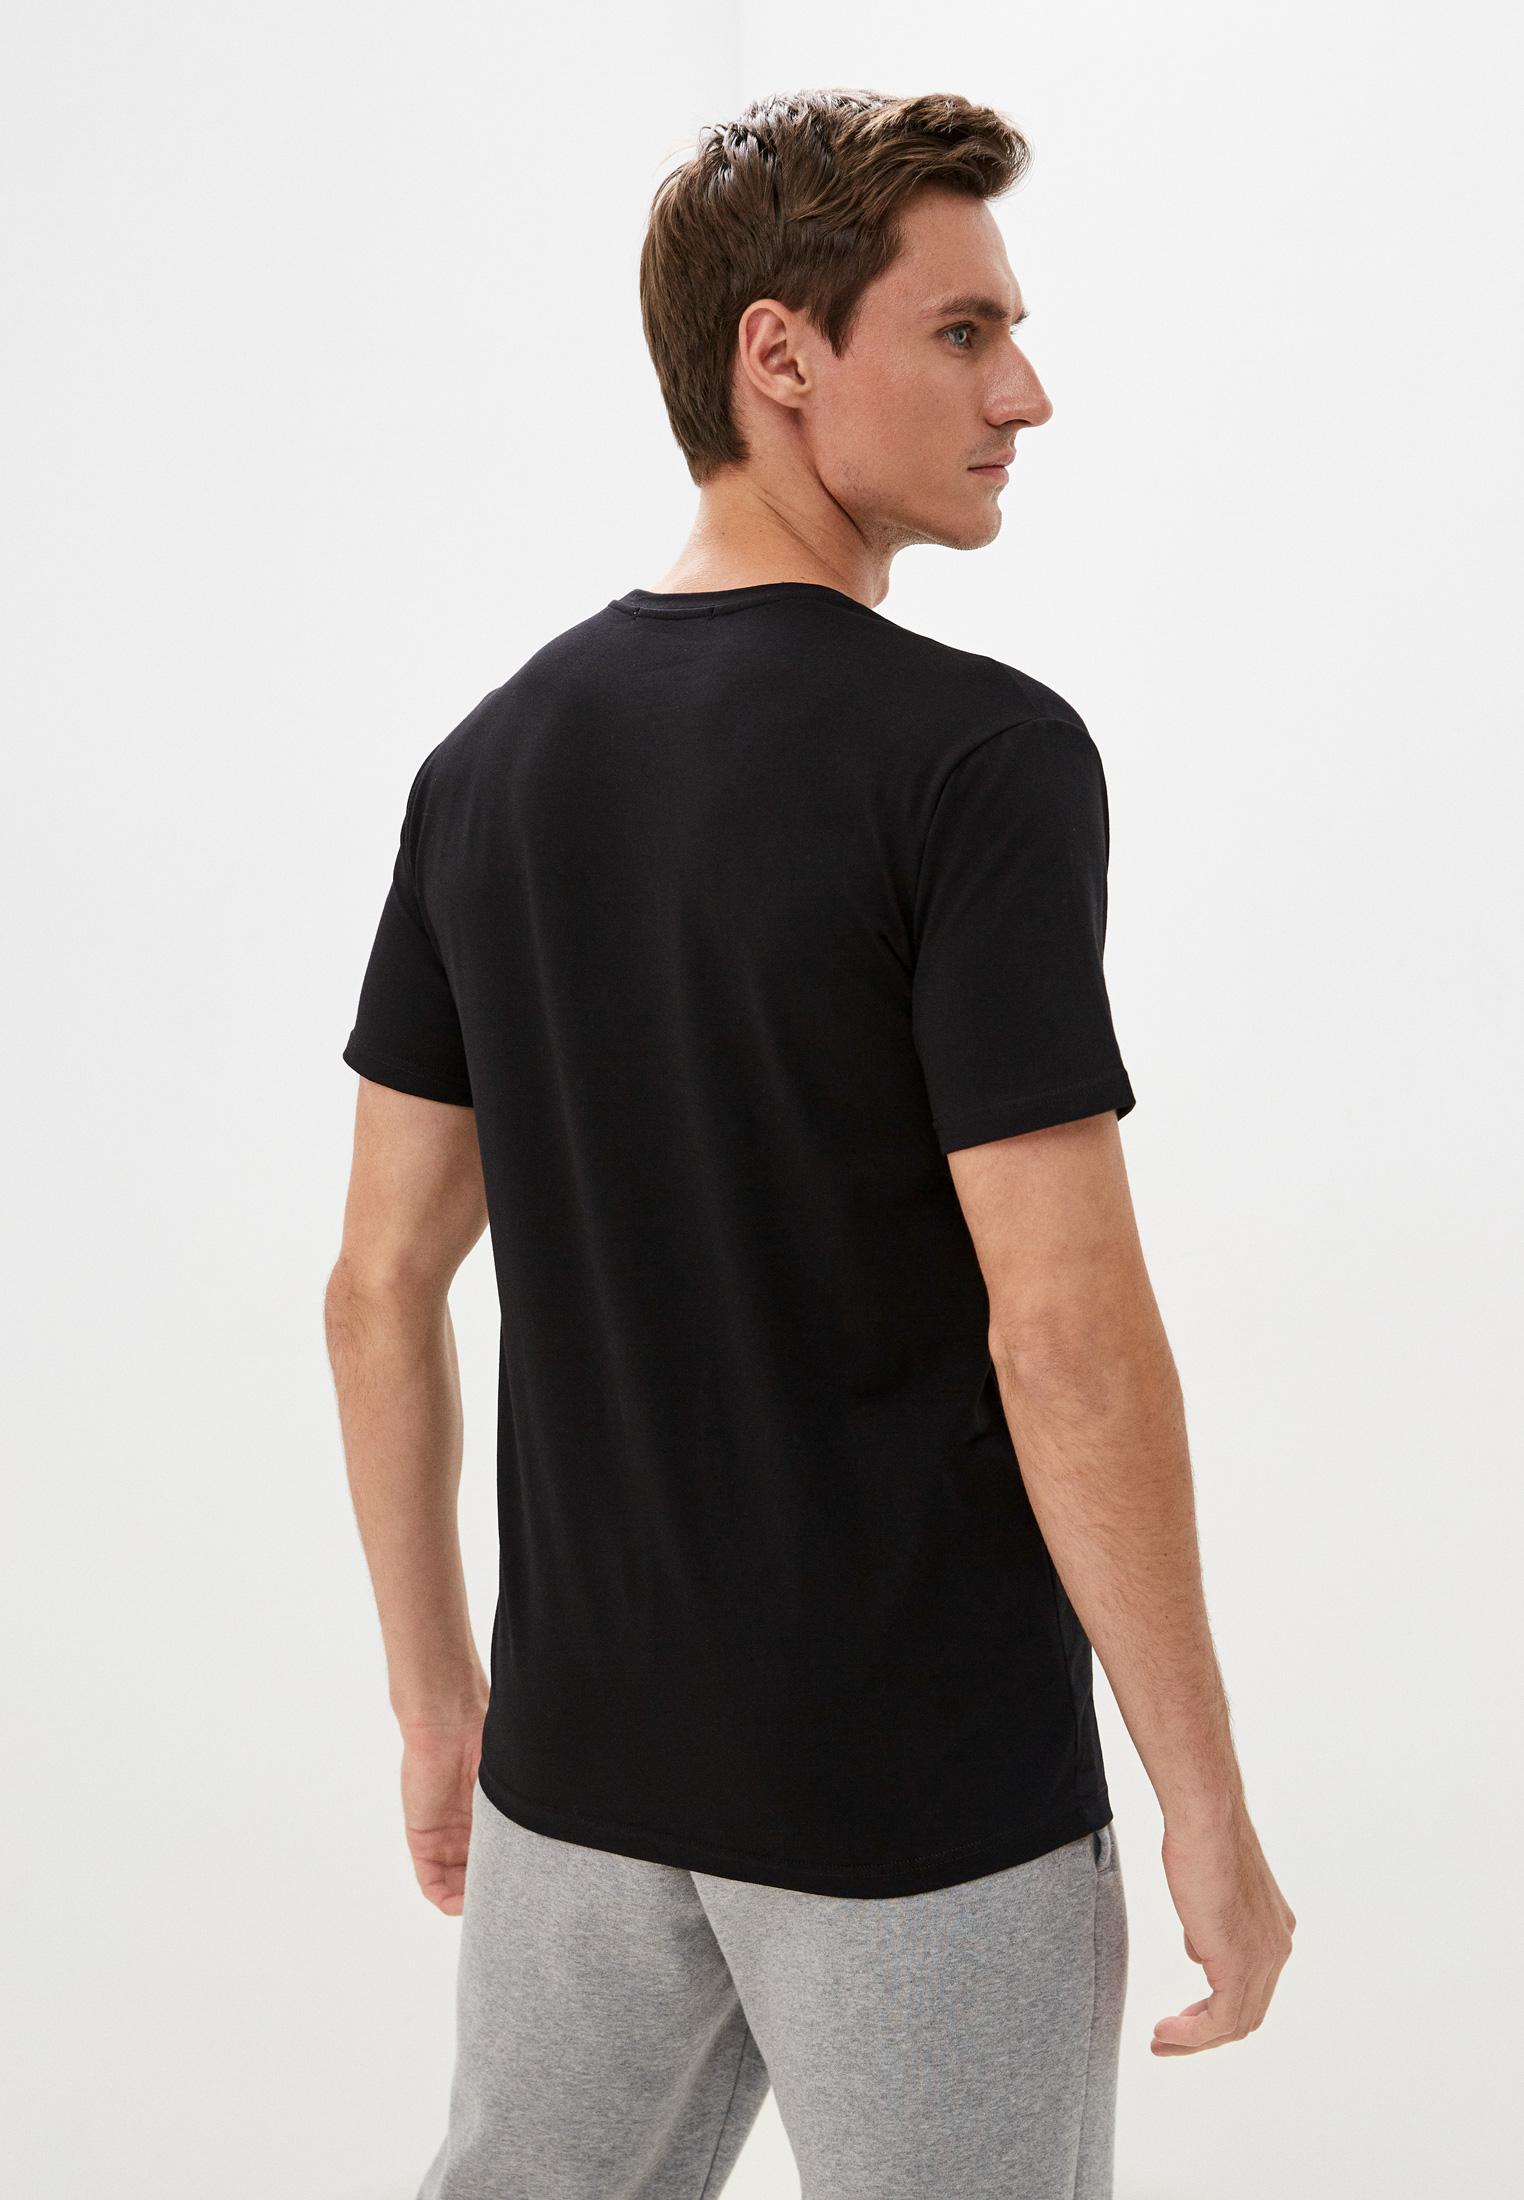 Мужская футболка Baldinini (Балдинини) TSU06: изображение 4